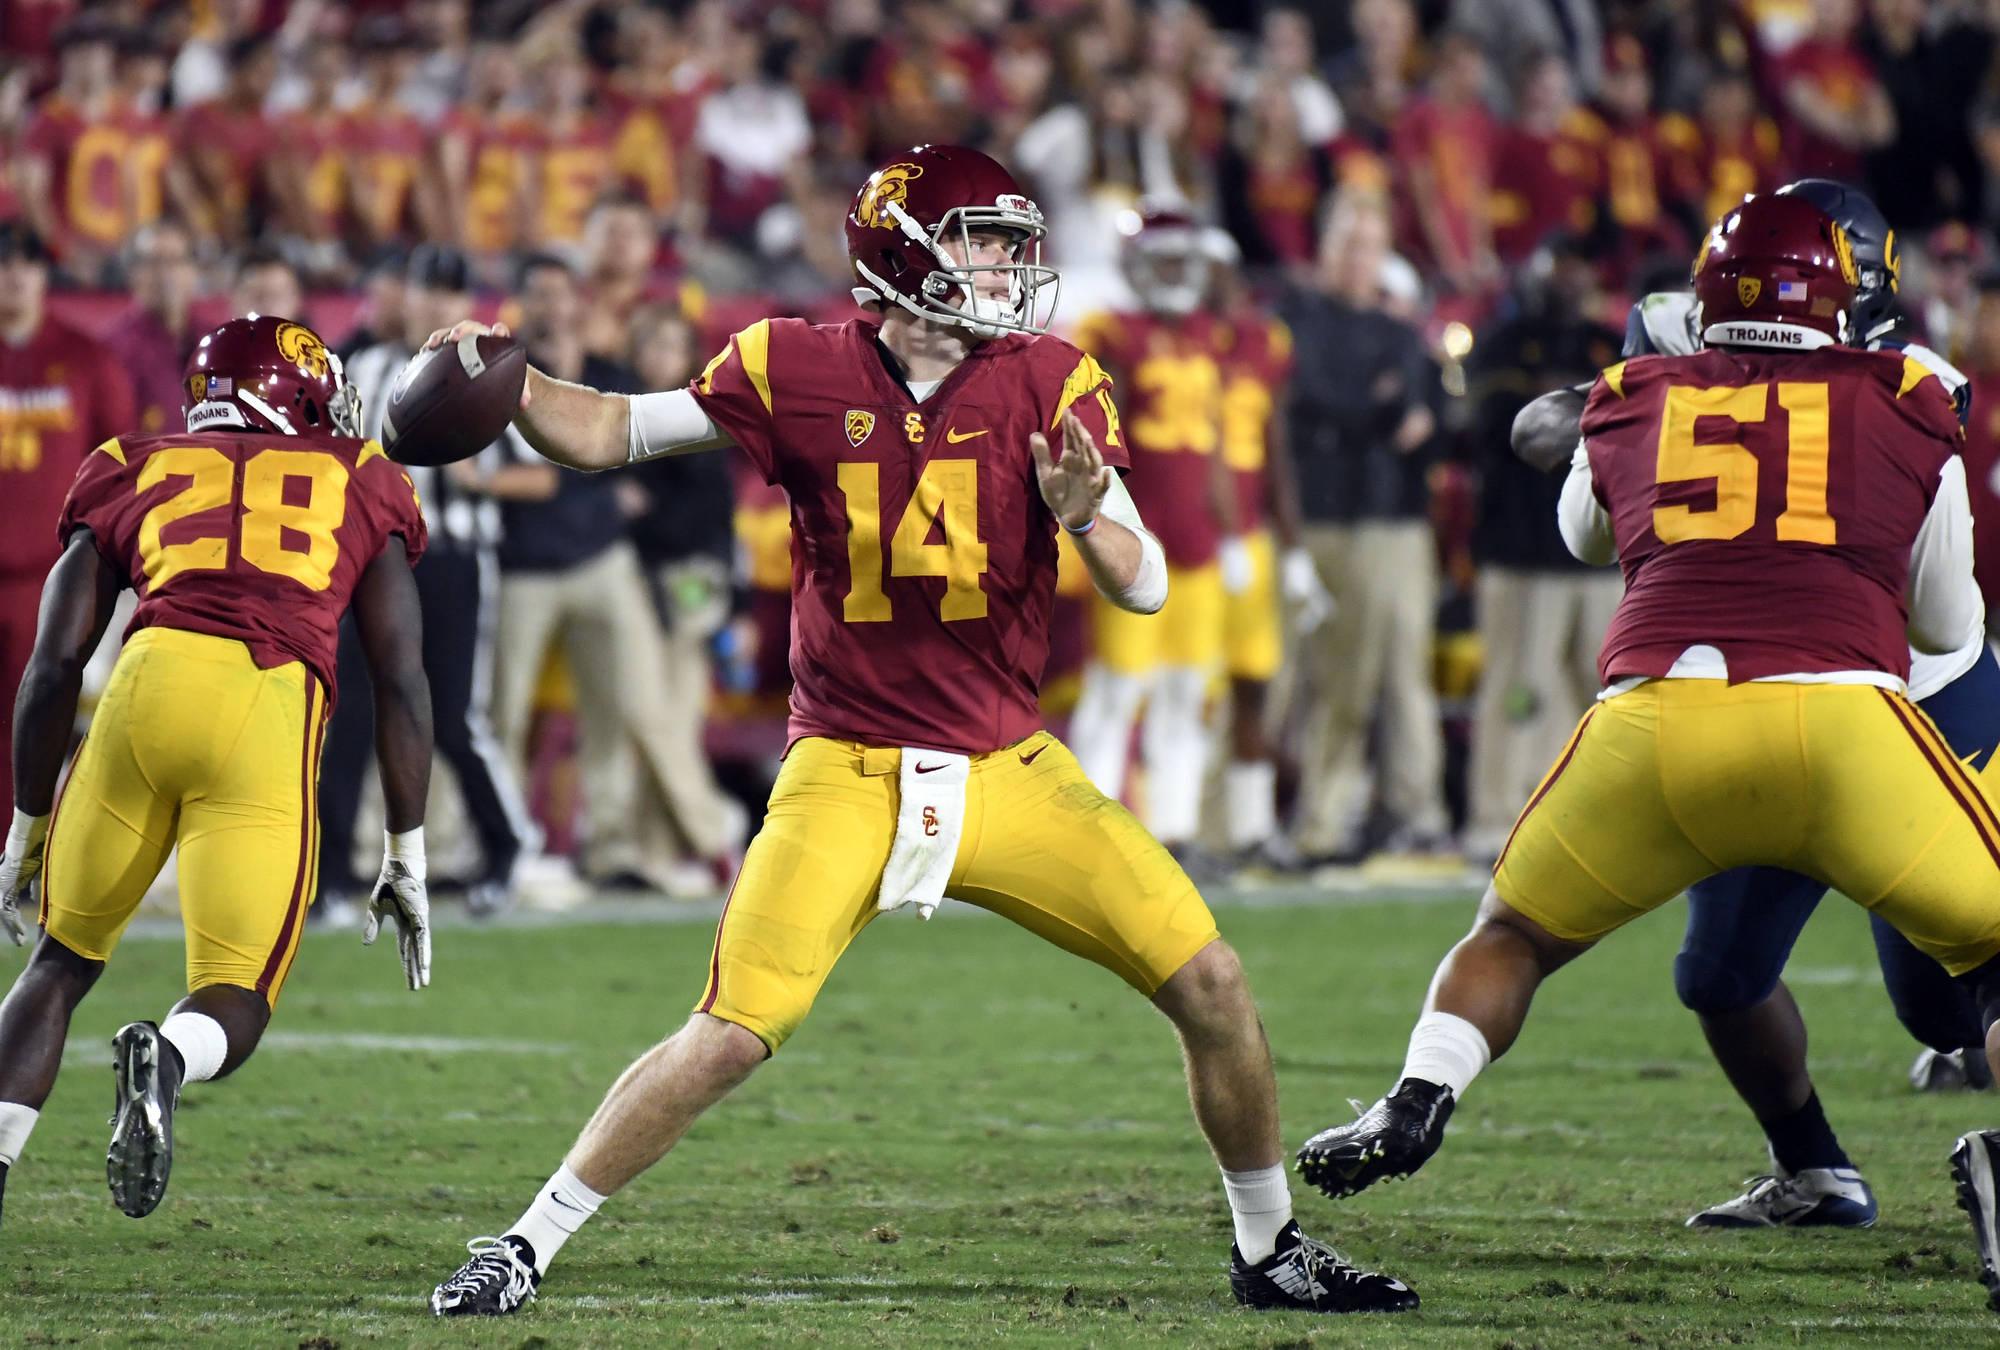 College Football: USC Trojans Maul the Bears